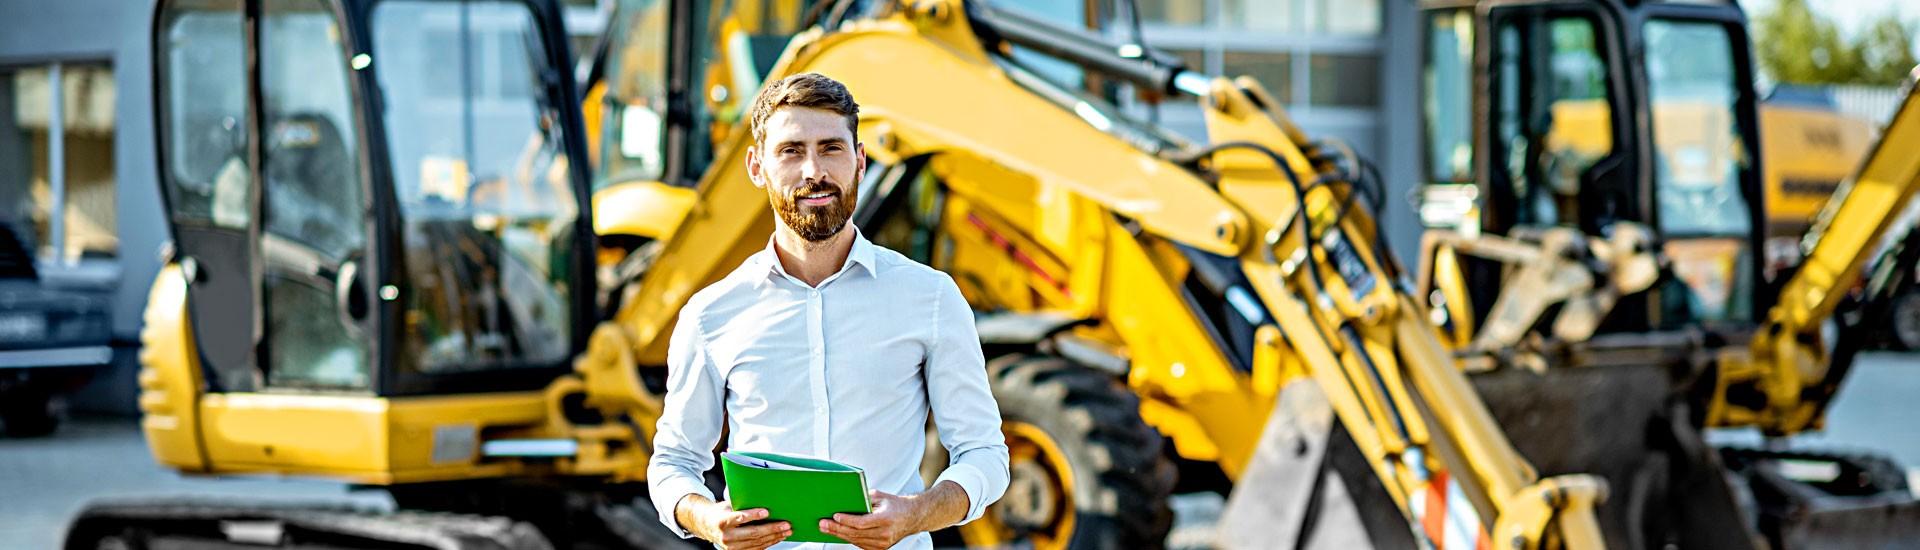 Produkte, Lösungen & Referenzen für den Baumaschinenhandel, Baugerätehandel, Baumaschinenverleih, Baugeräteverleih...